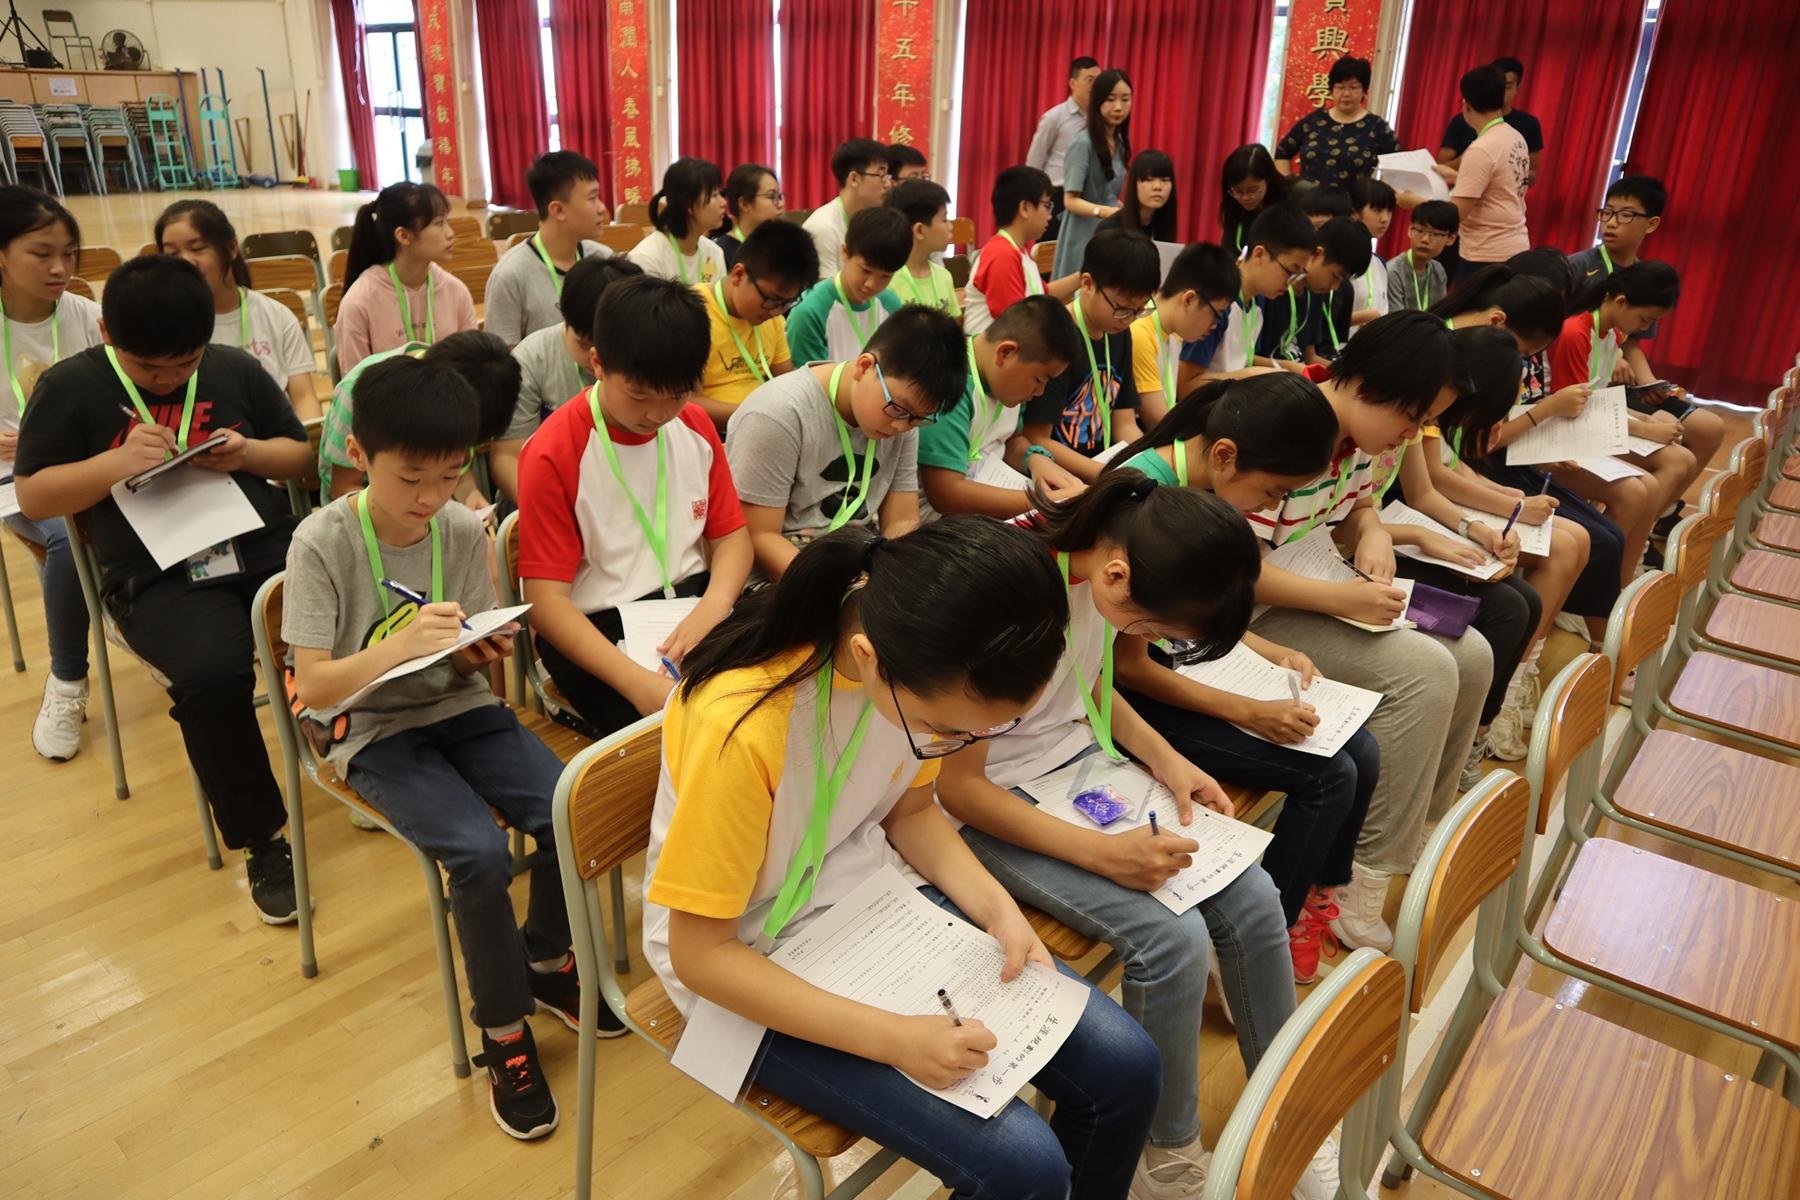 https://npc.edu.hk/sites/default/files/img_9225_2.jpg